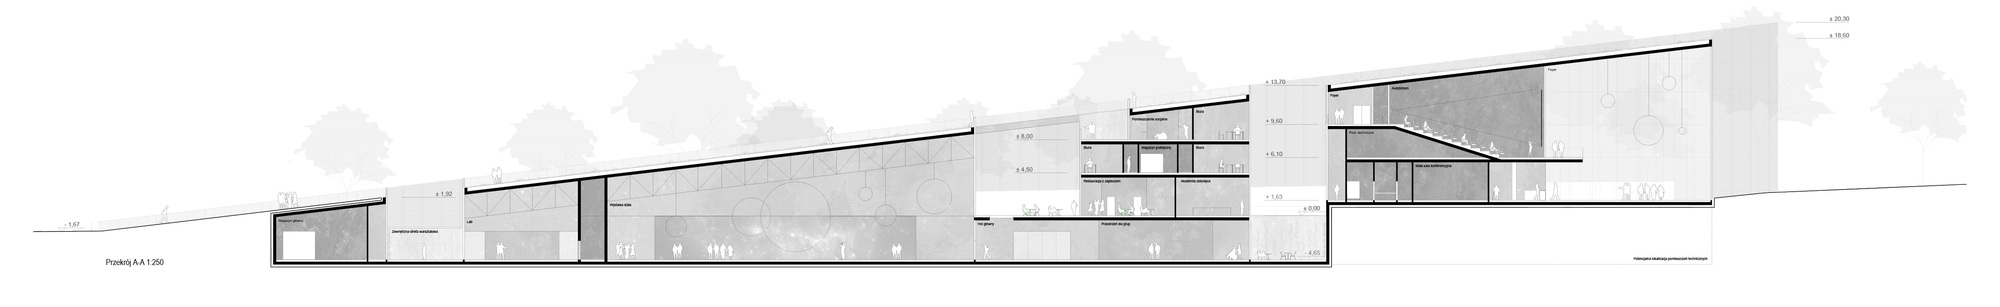 Heinle Wischer Partner gallery of heinle wischer and partner awarded place in